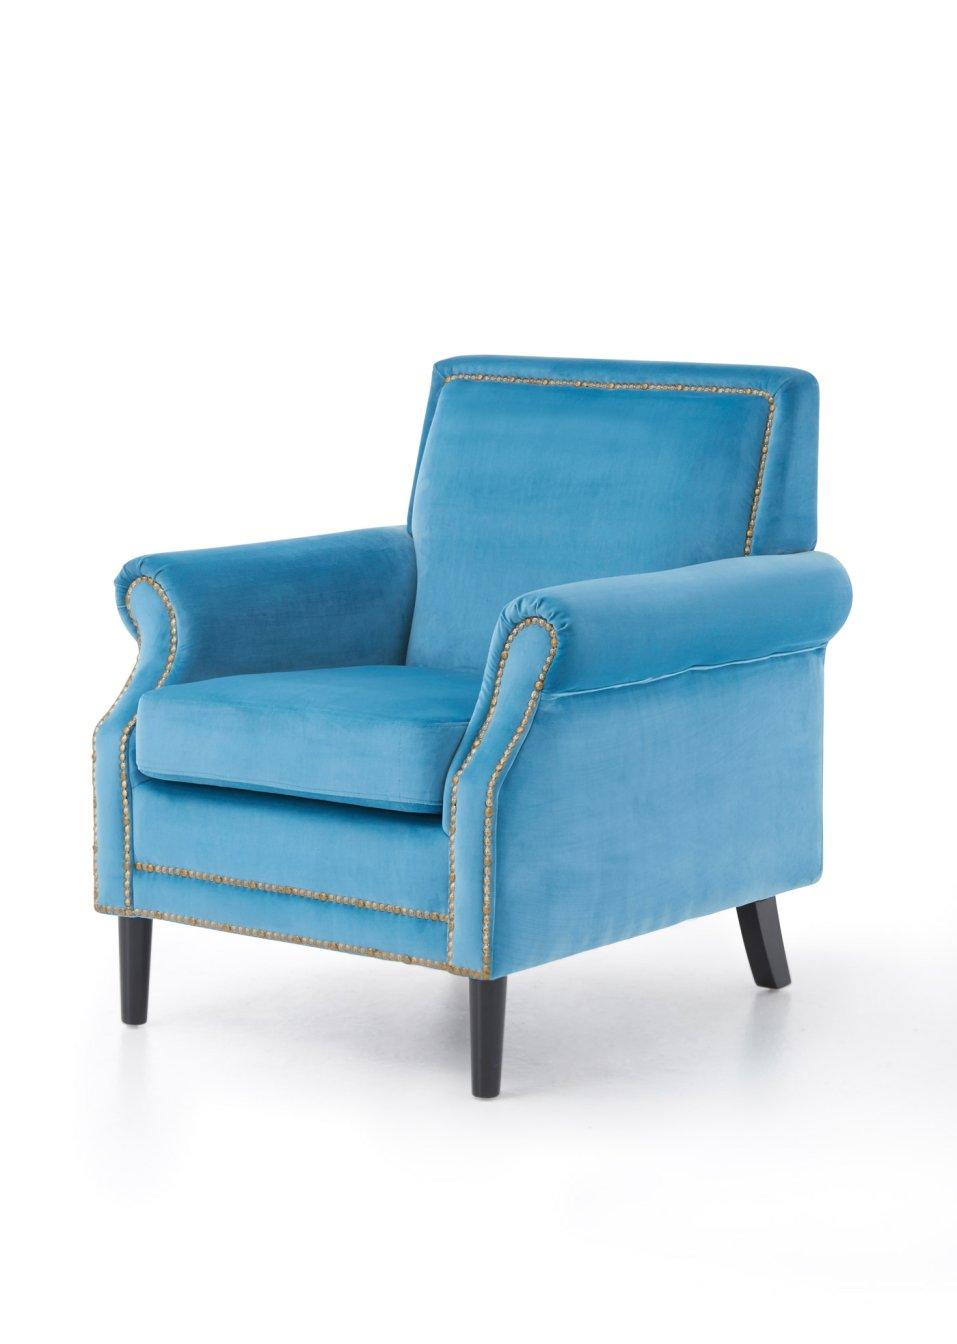 sessel mirza t rkis wohnen bpc living. Black Bedroom Furniture Sets. Home Design Ideas